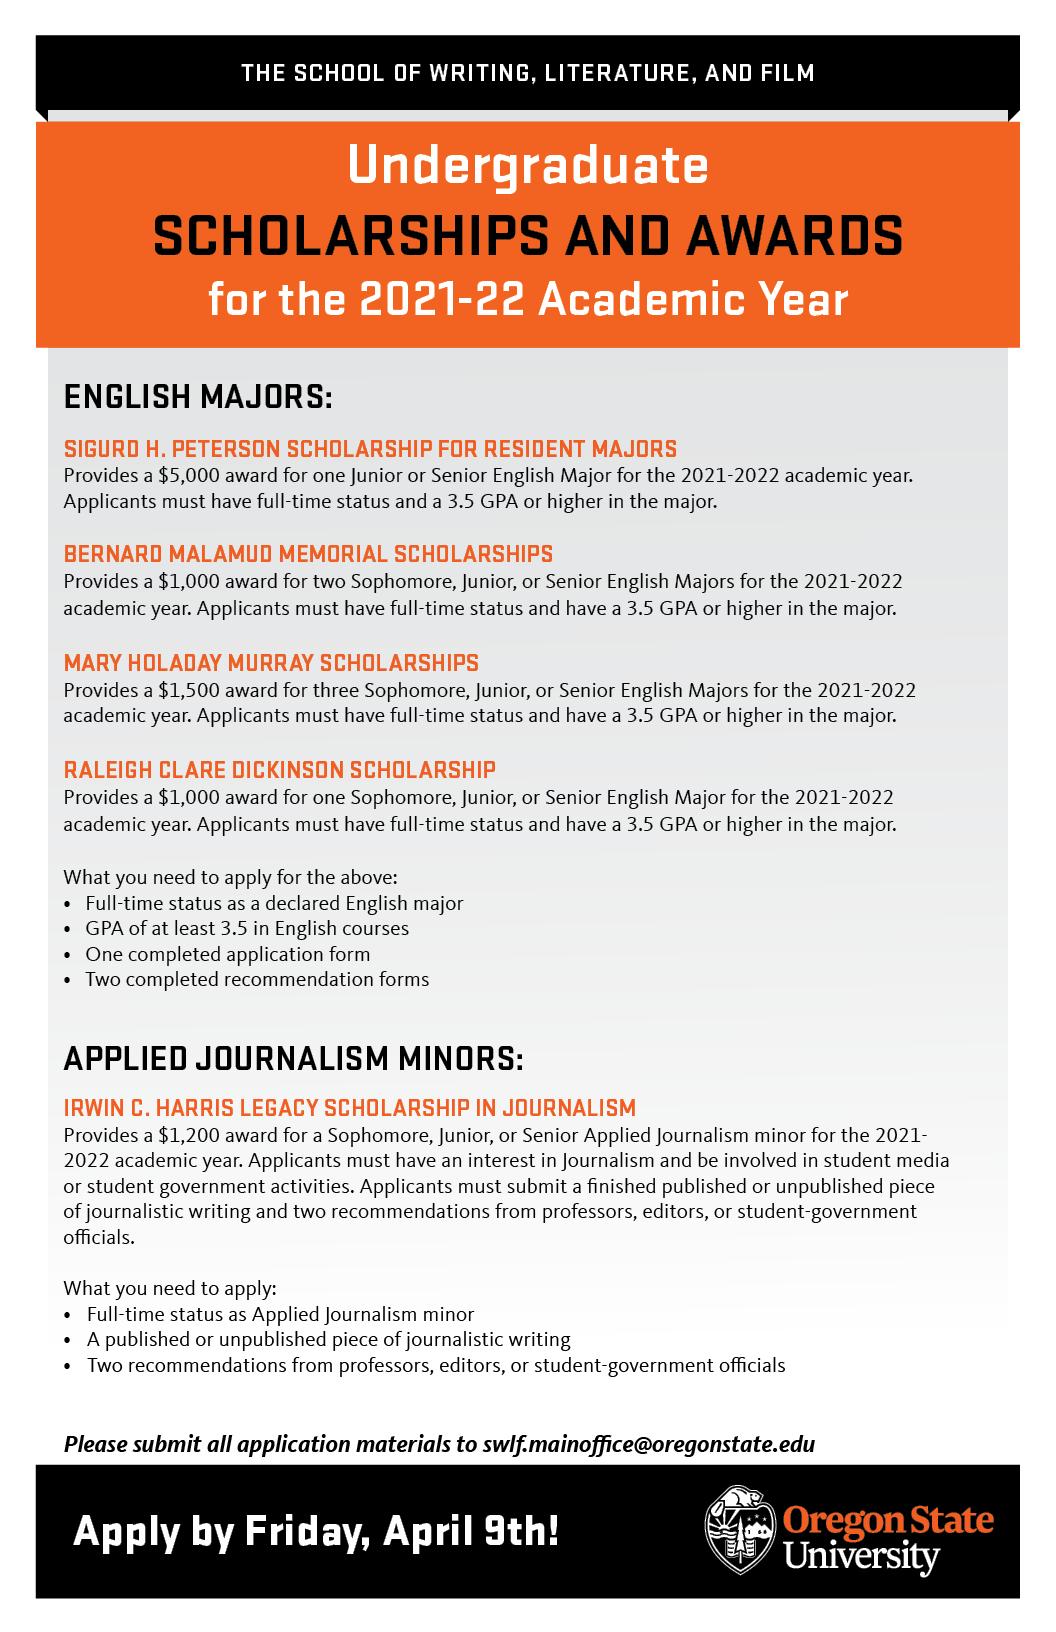 Osu 2022 Calendar.2021 2022 Scholarship Applications College Of Liberal Arts Oregon State University